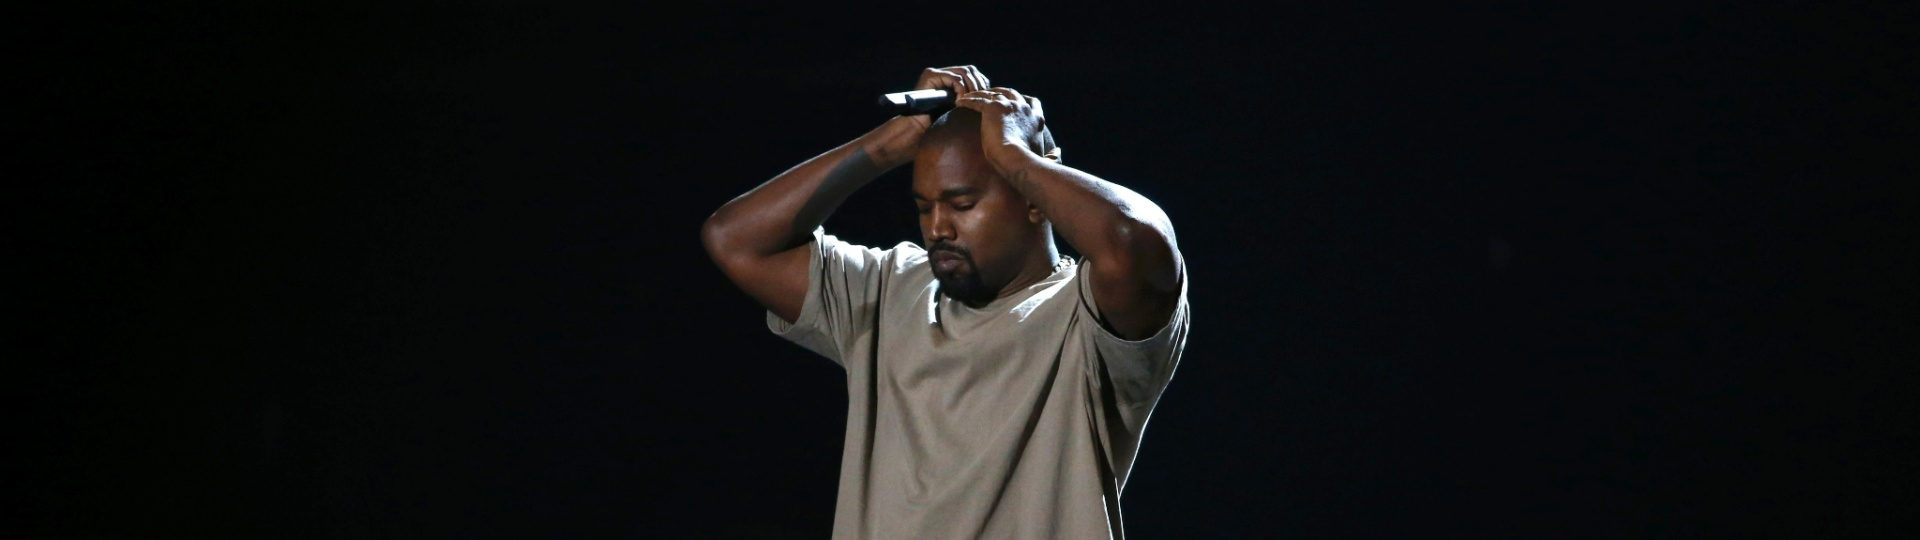 30.ago.2015 - Kanye West discursa após receber o prêmio de Michael Jackson Video Vanguard Award